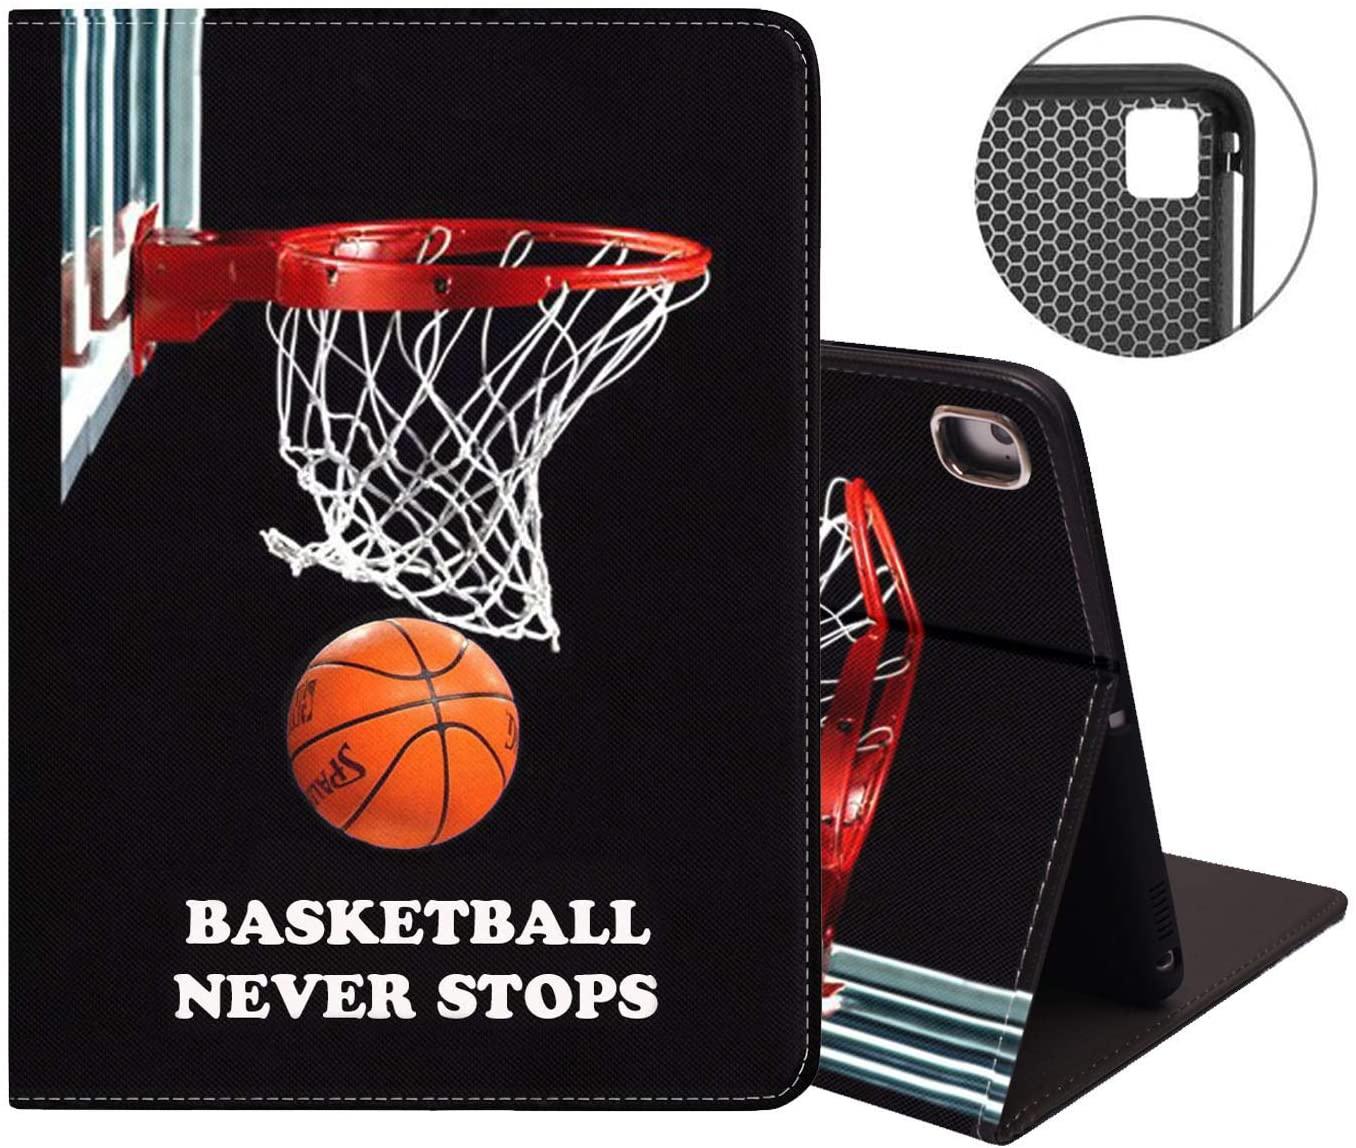 iPad Mini 5/Mini 4 Case, iPad Mini 1/2/3 Case, Protective Leather Case, Adjustable Stand Auto Wake&Sleep Smart Case for iPad Mini 5th/4th Gen 7.9 inch - Basketball Never Stops